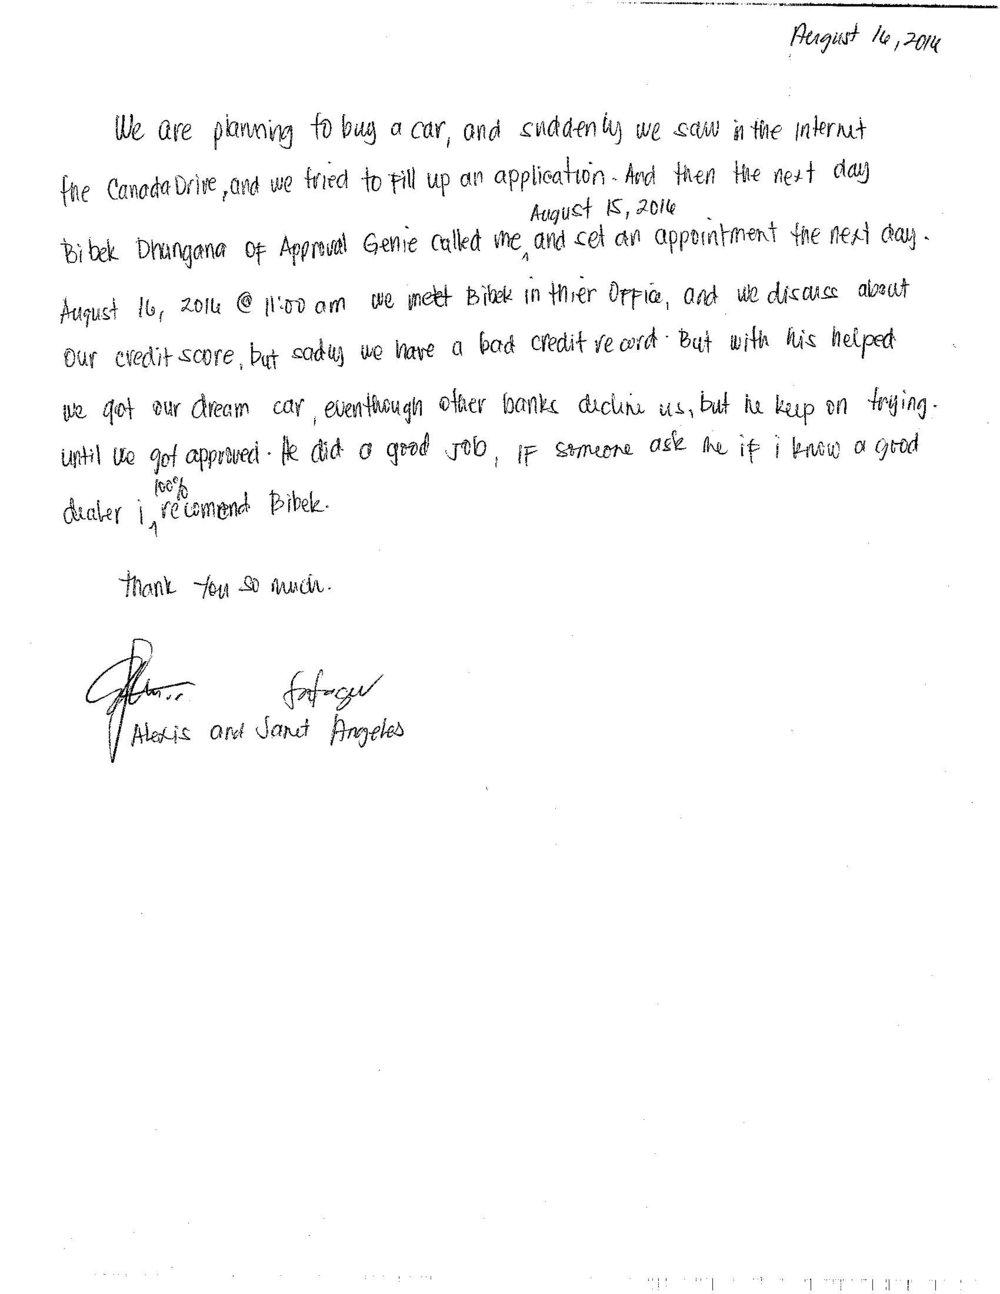 Alexis Angeles & Janet Angeles_Testimonial.jpg